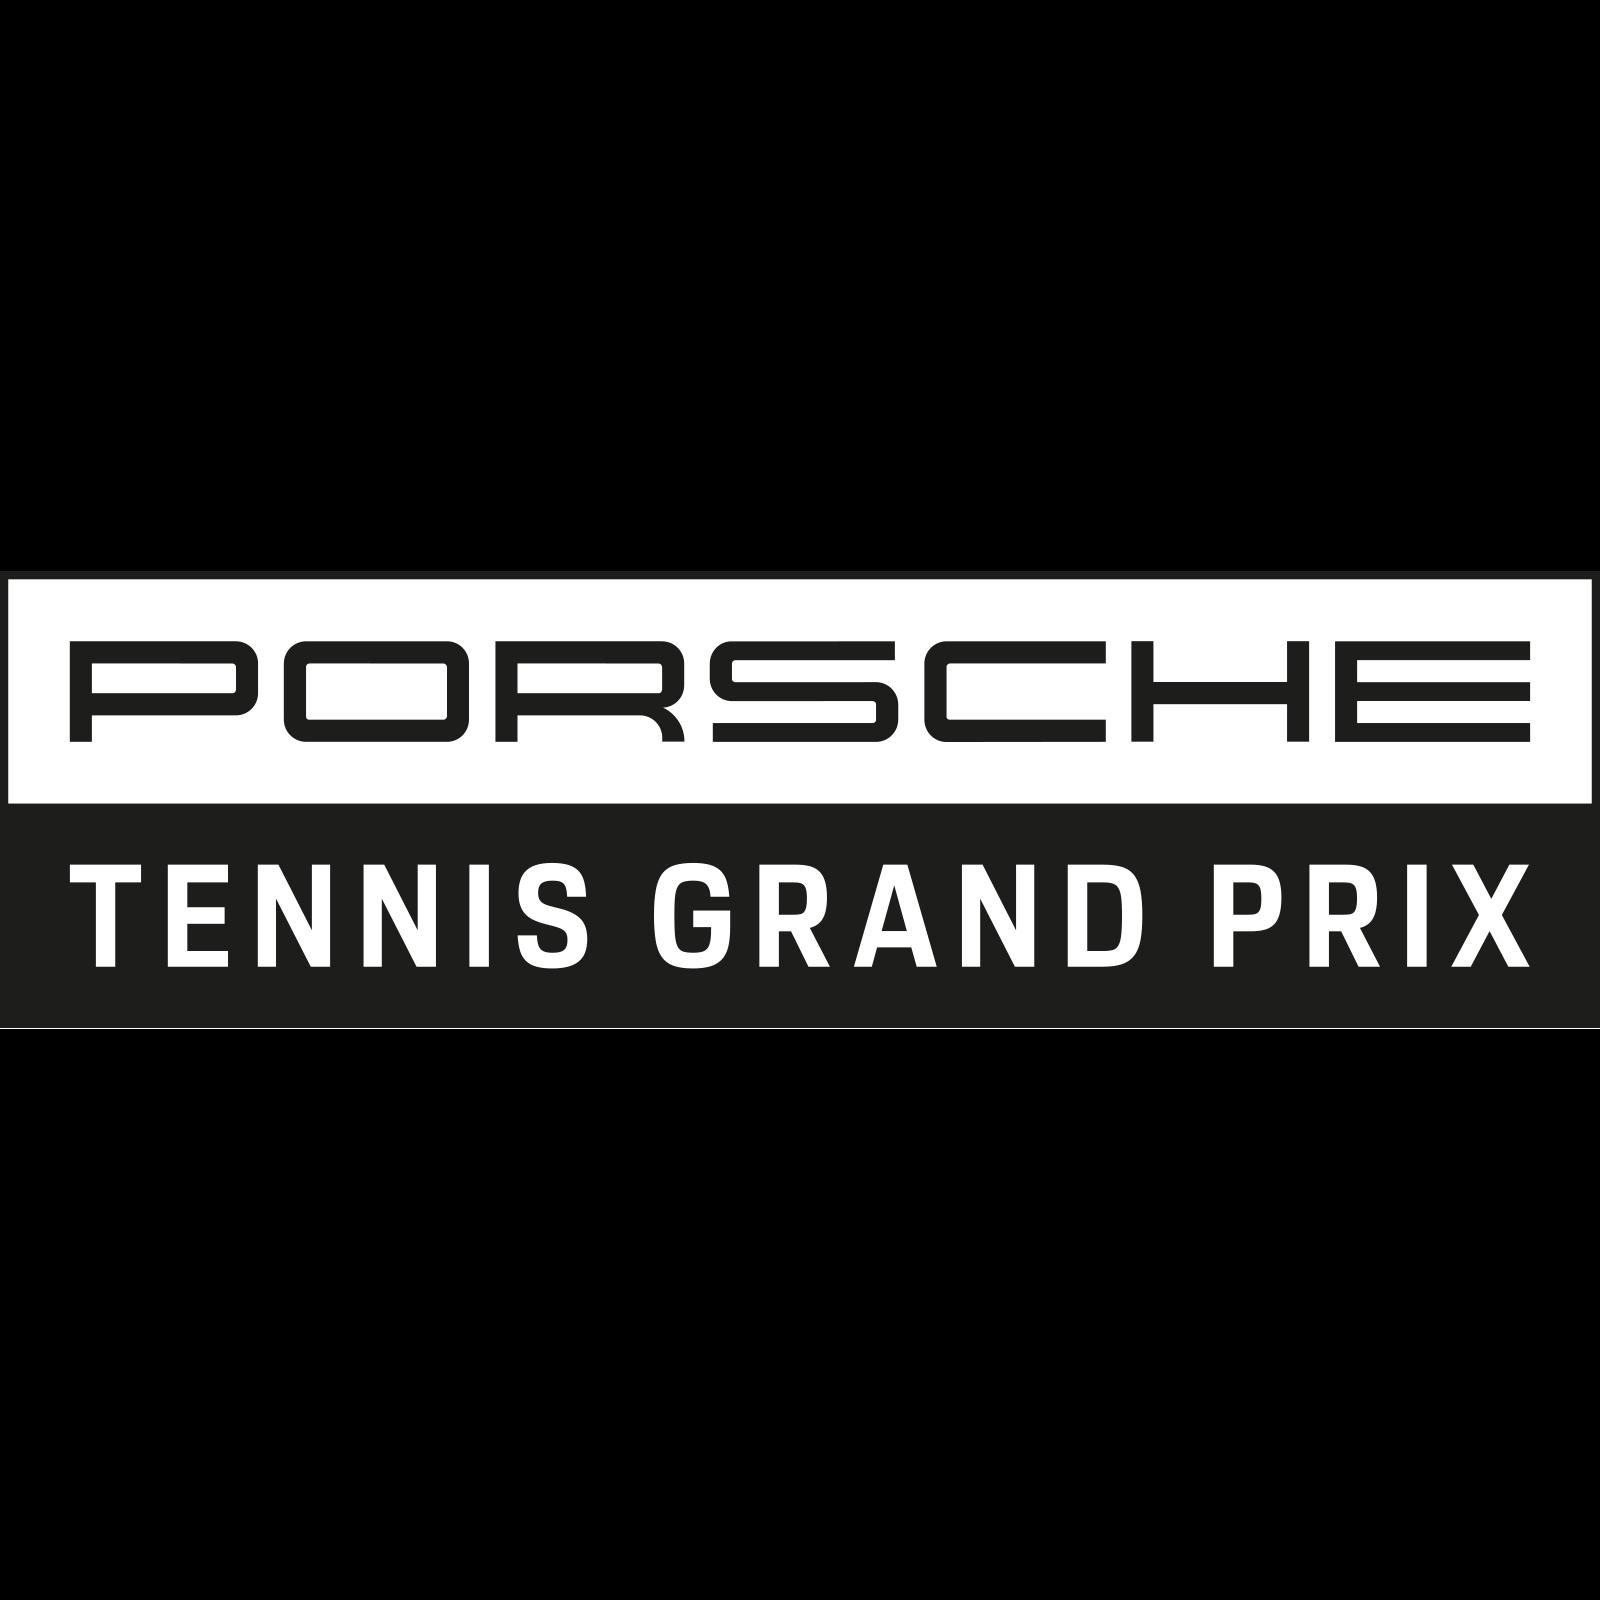 2019 WTA Tour - Porsche Tennis Grand Prix